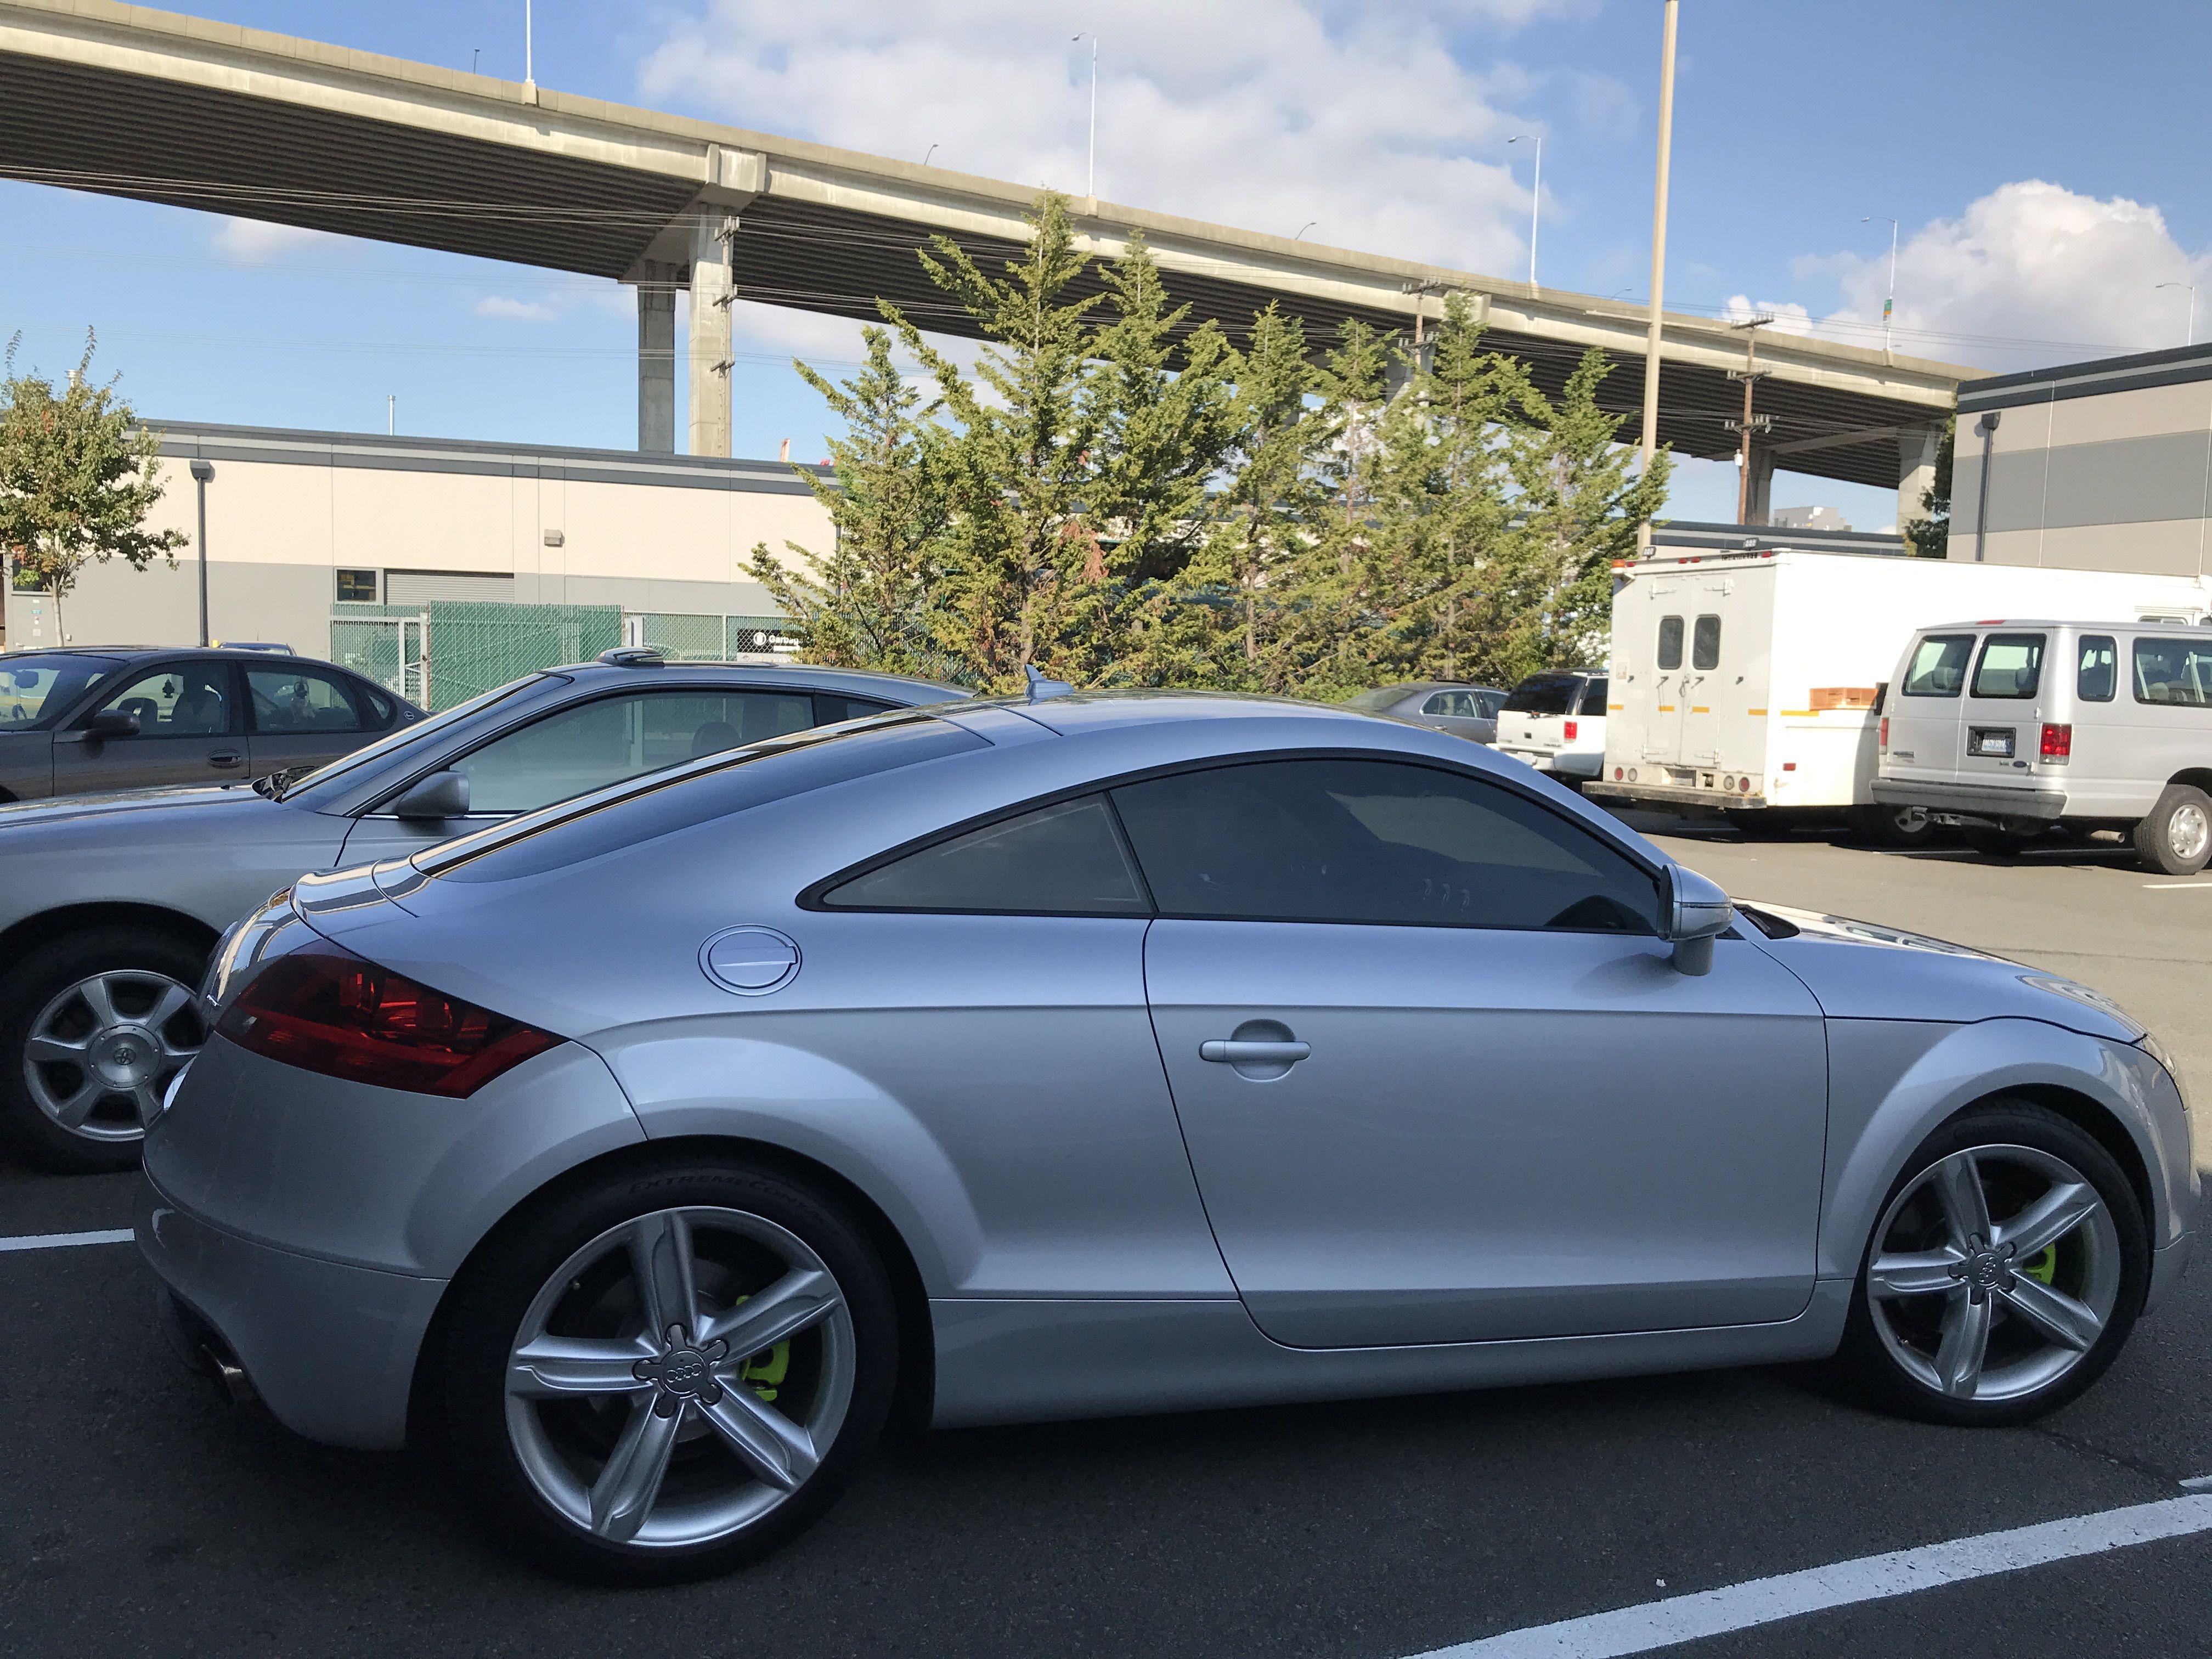 Audi Tt 3m Color Stable Window Tint Car Window Tinting Seattle